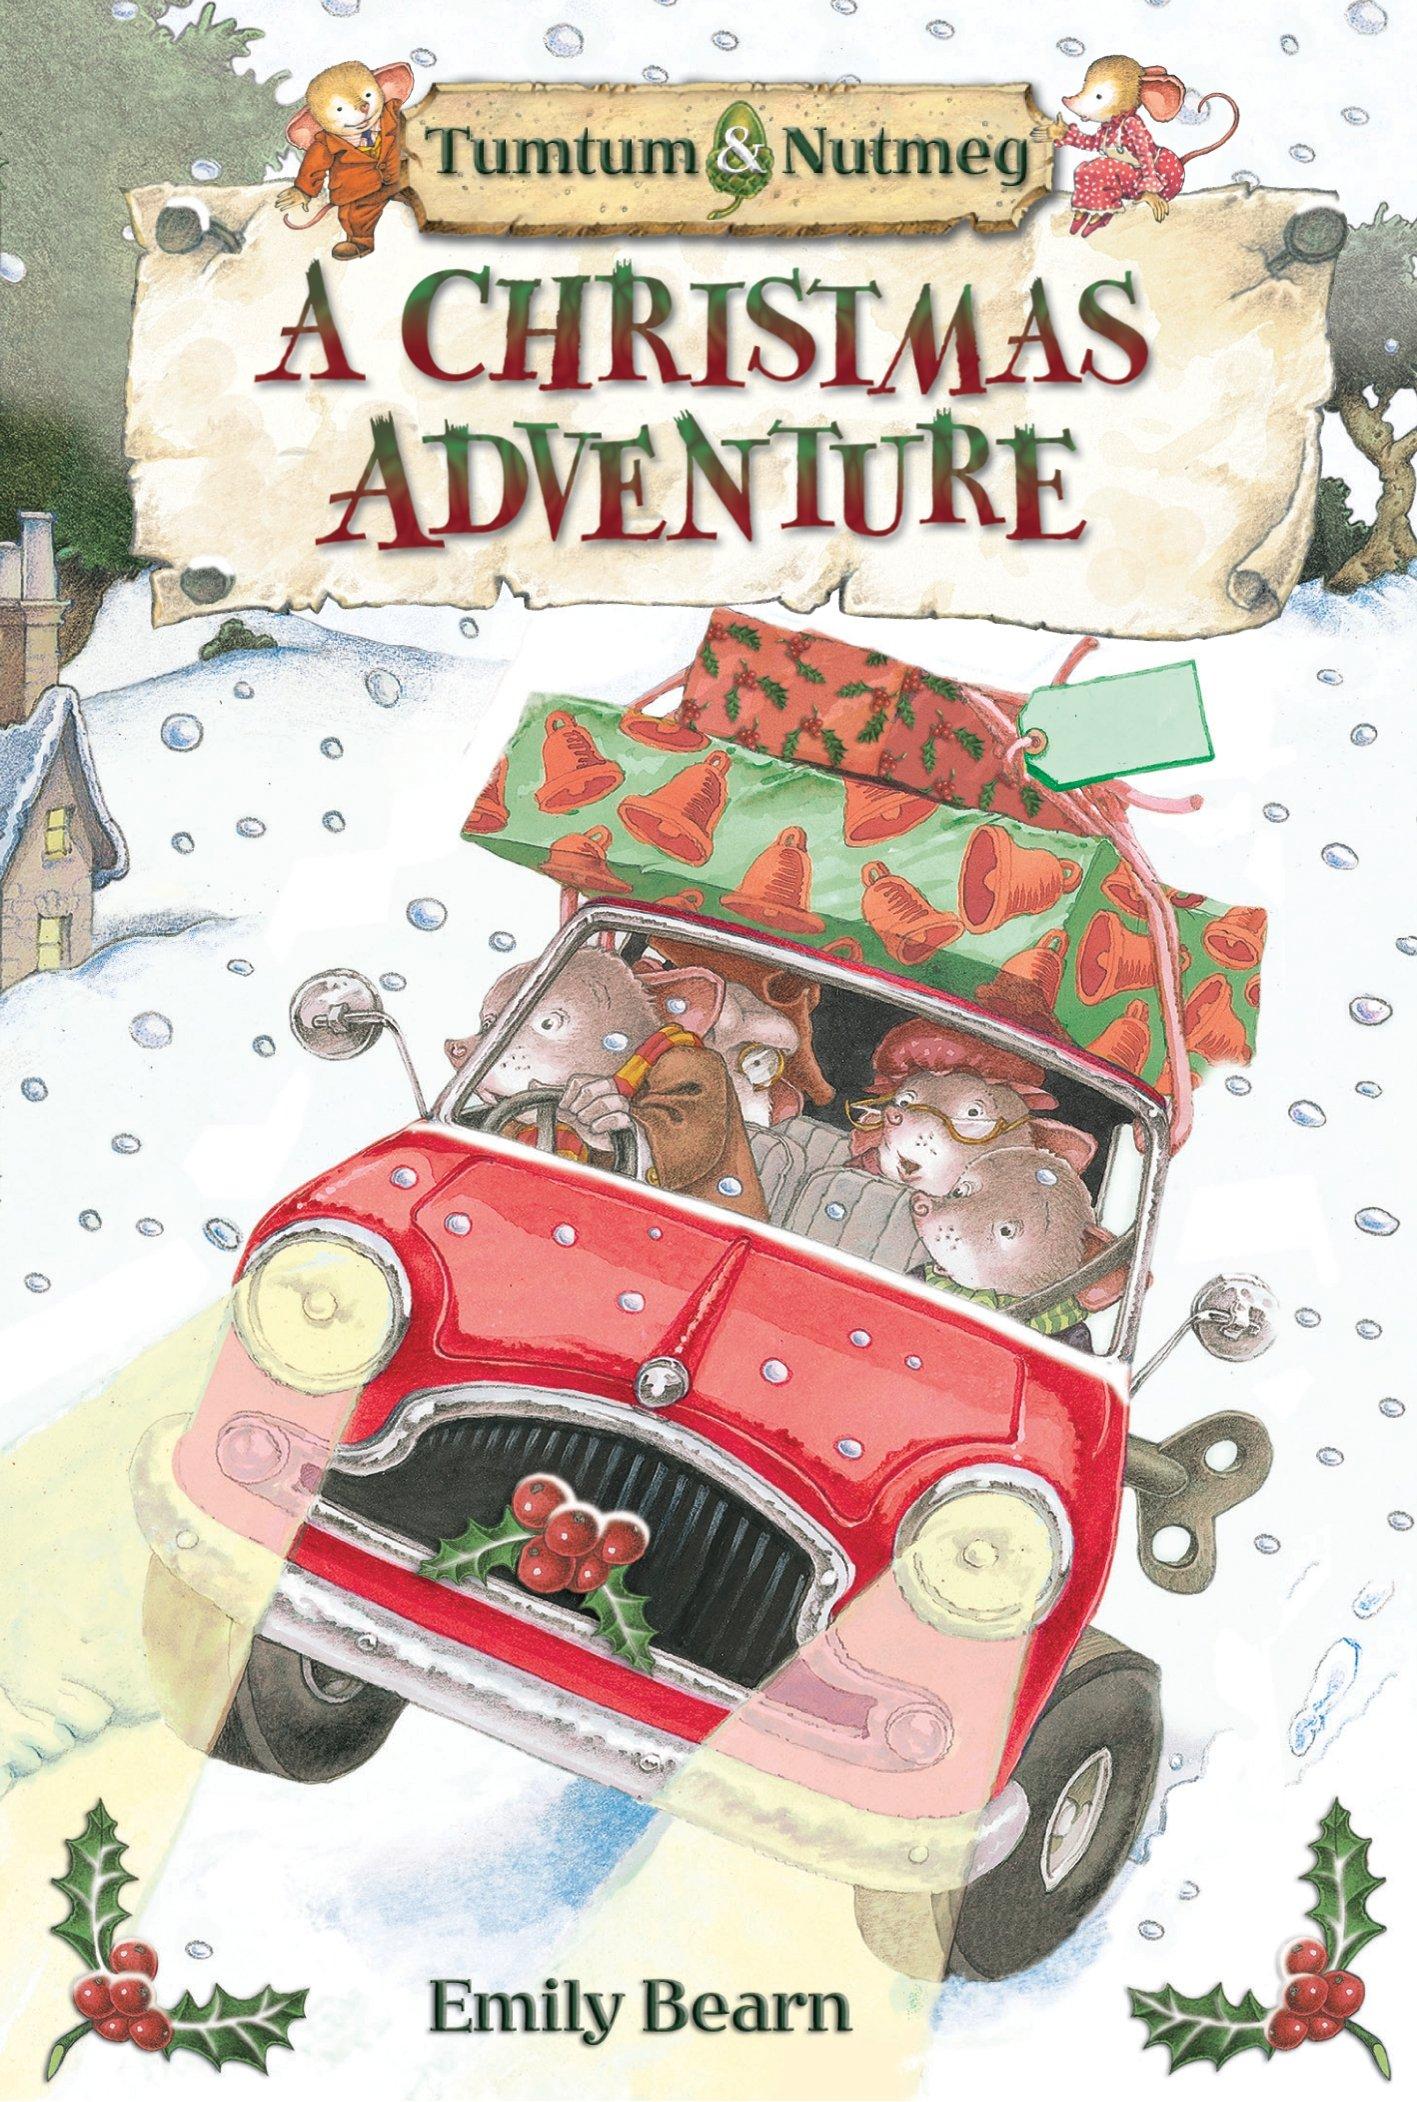 Tumtum & Nutmeg's Christmas Adventure: Emily Bearn: 9781405250269:  Amazon.com: Books